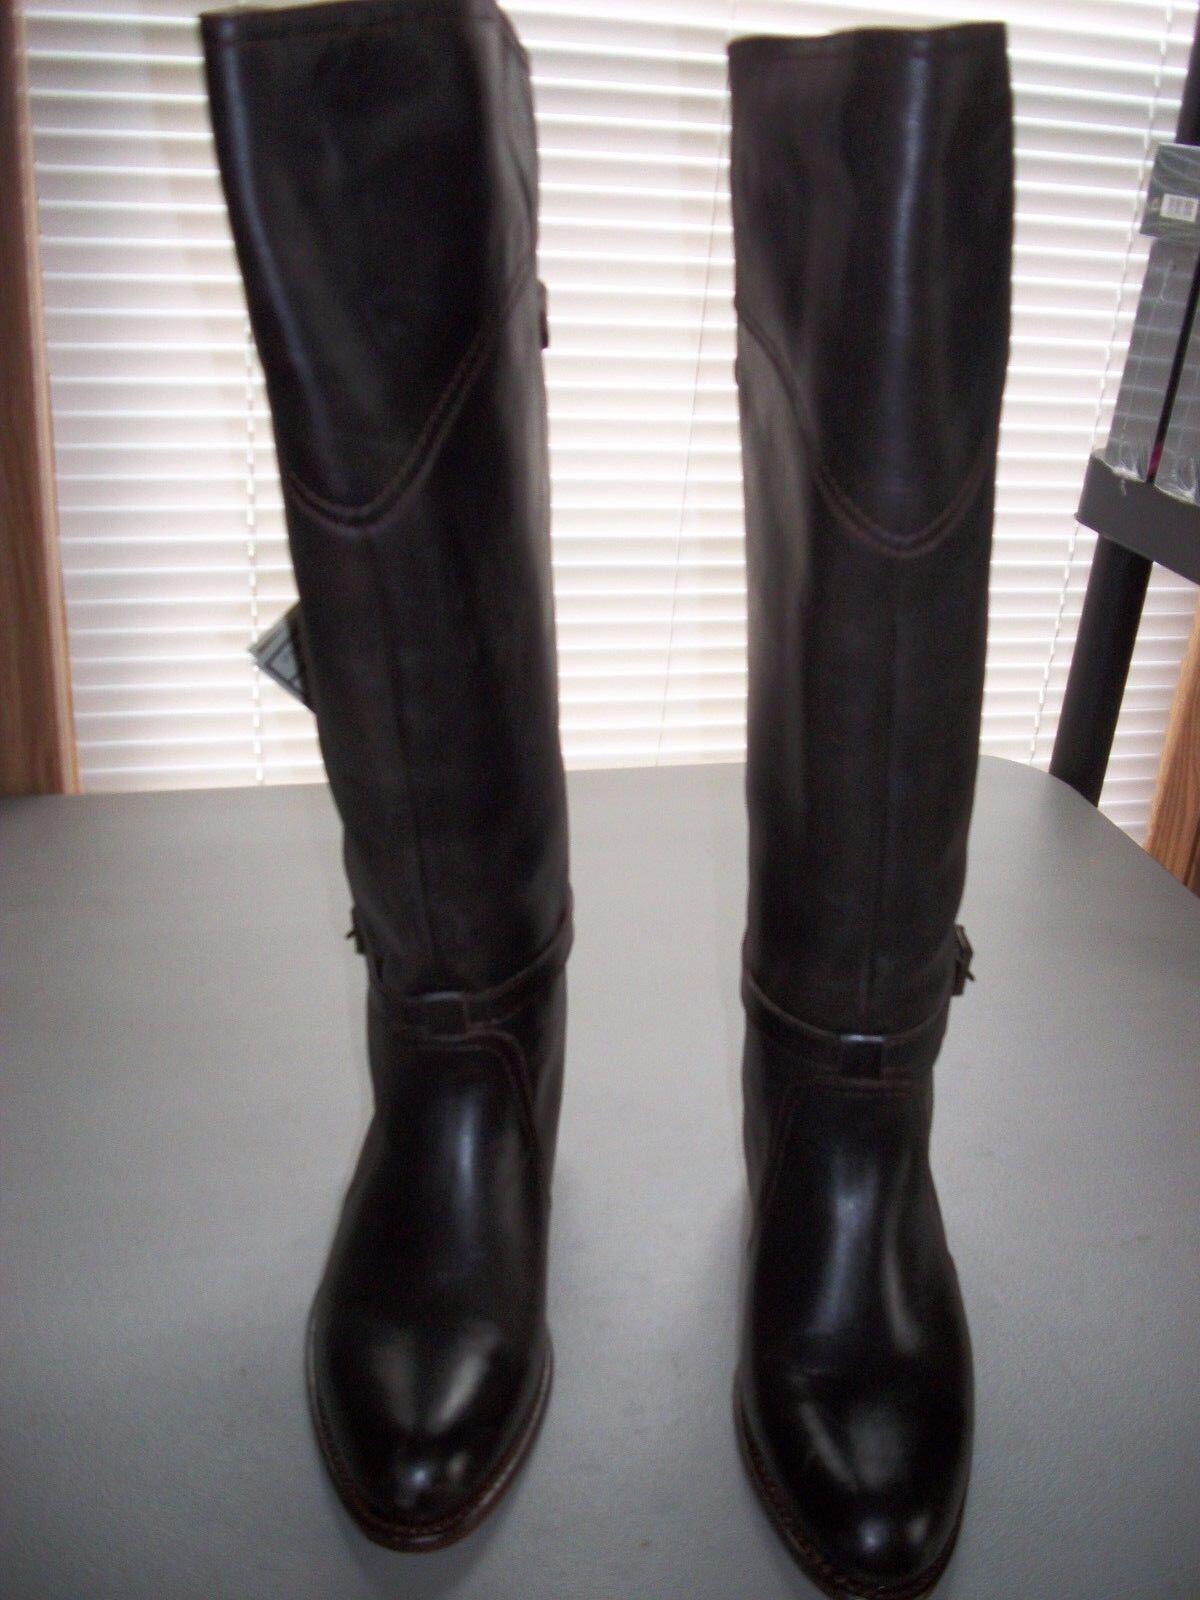 170d7078964 Frye Dorado Riding, Size Size Size 7.5 M,Dark Brown, New In Box ...